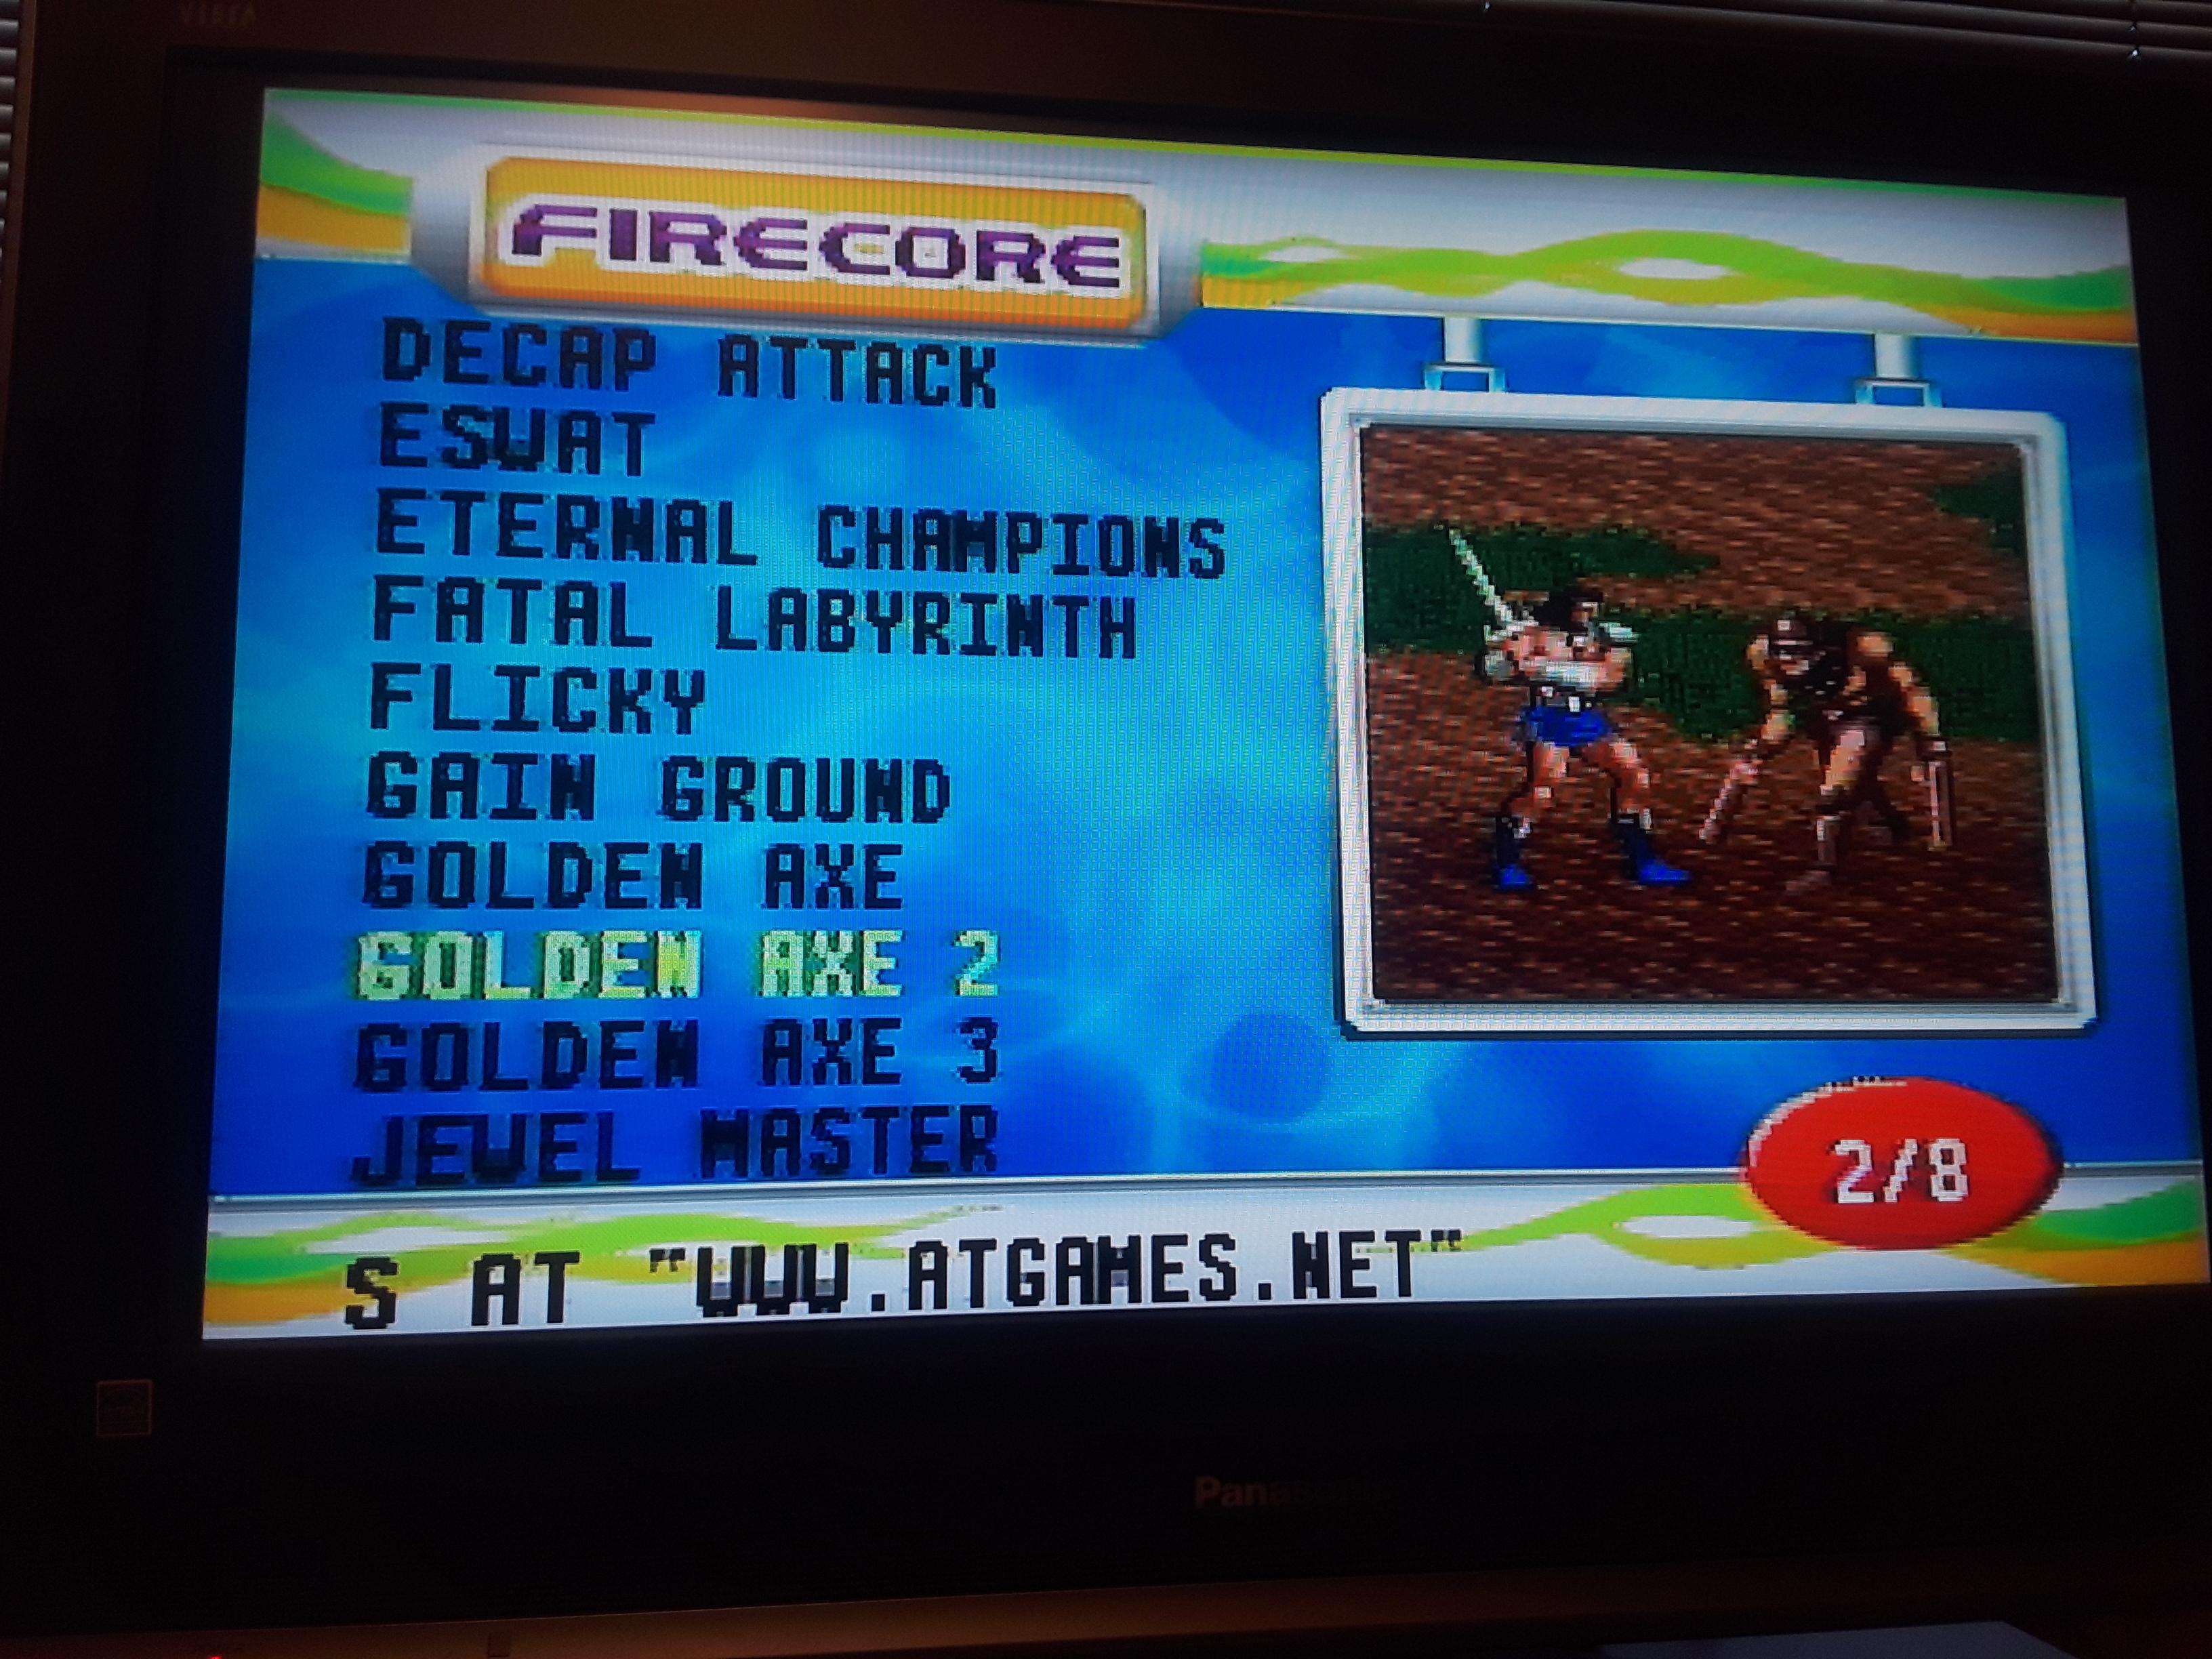 JML101582: Golden Axe II [The Duel] (Sega Genesis / MegaDrive Emulated) 30 points on 2018-07-15 14:47:33